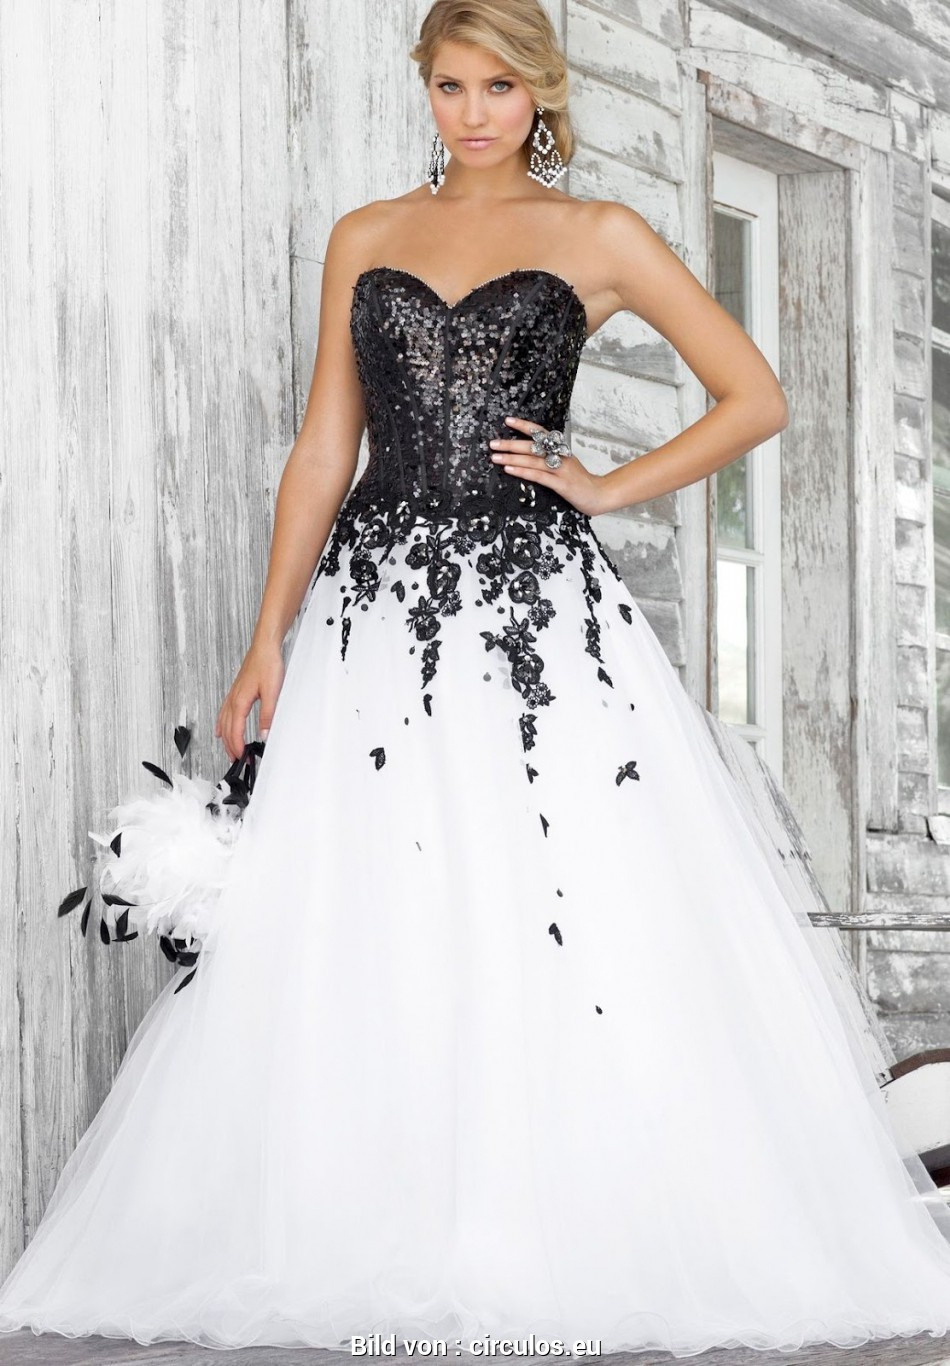 20 Genial Zalando Abendkleider Vertrieb10 Spektakulär Zalando Abendkleider Design